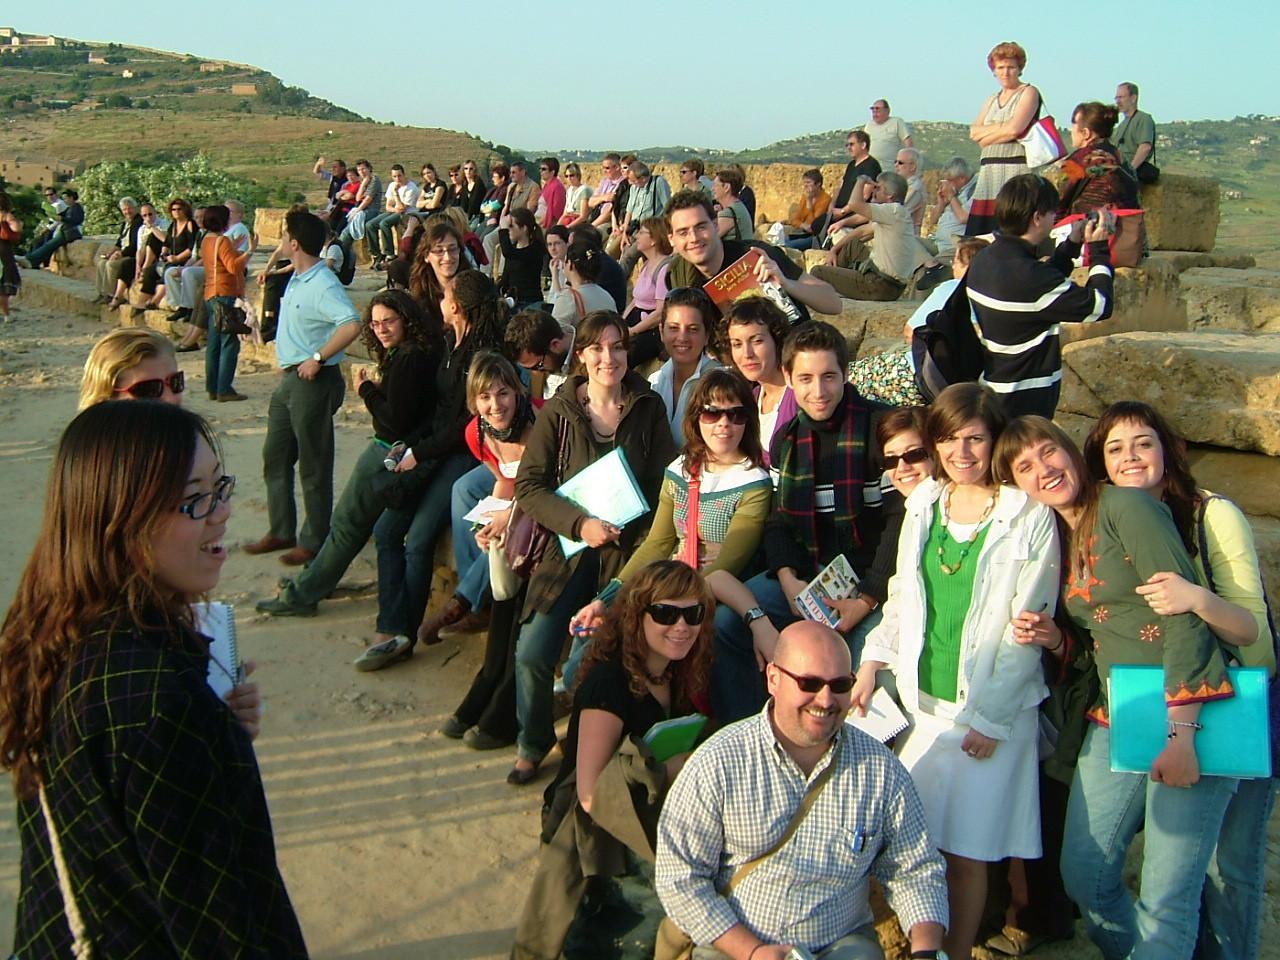 2007. Agrillento.